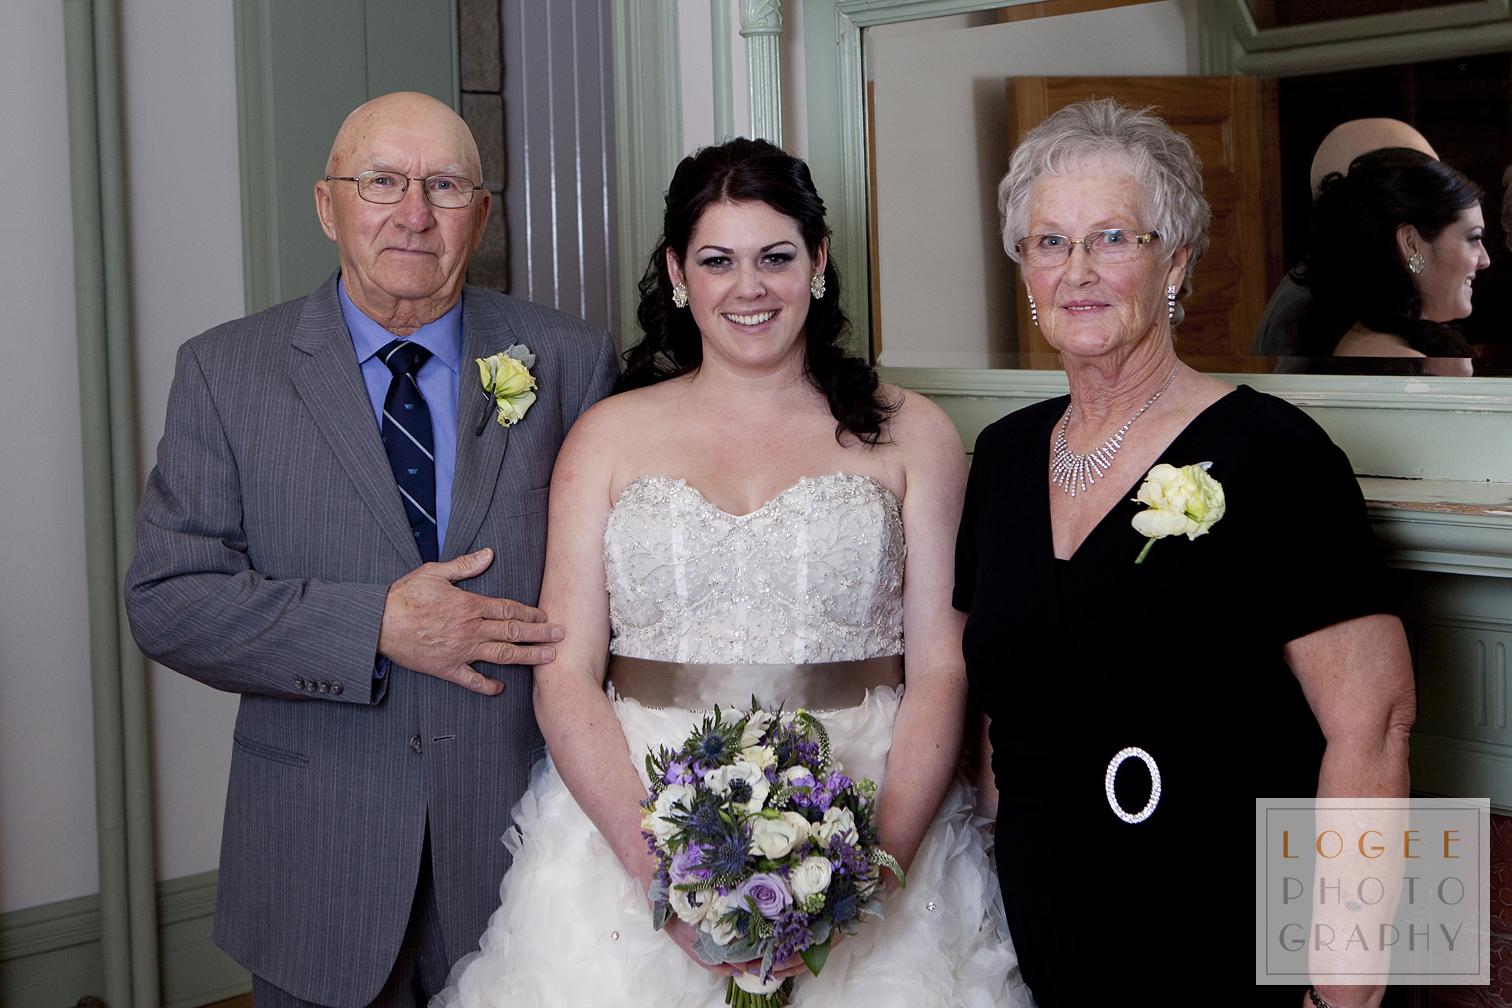 McIntosh-Burns Wedding - 7026Aw